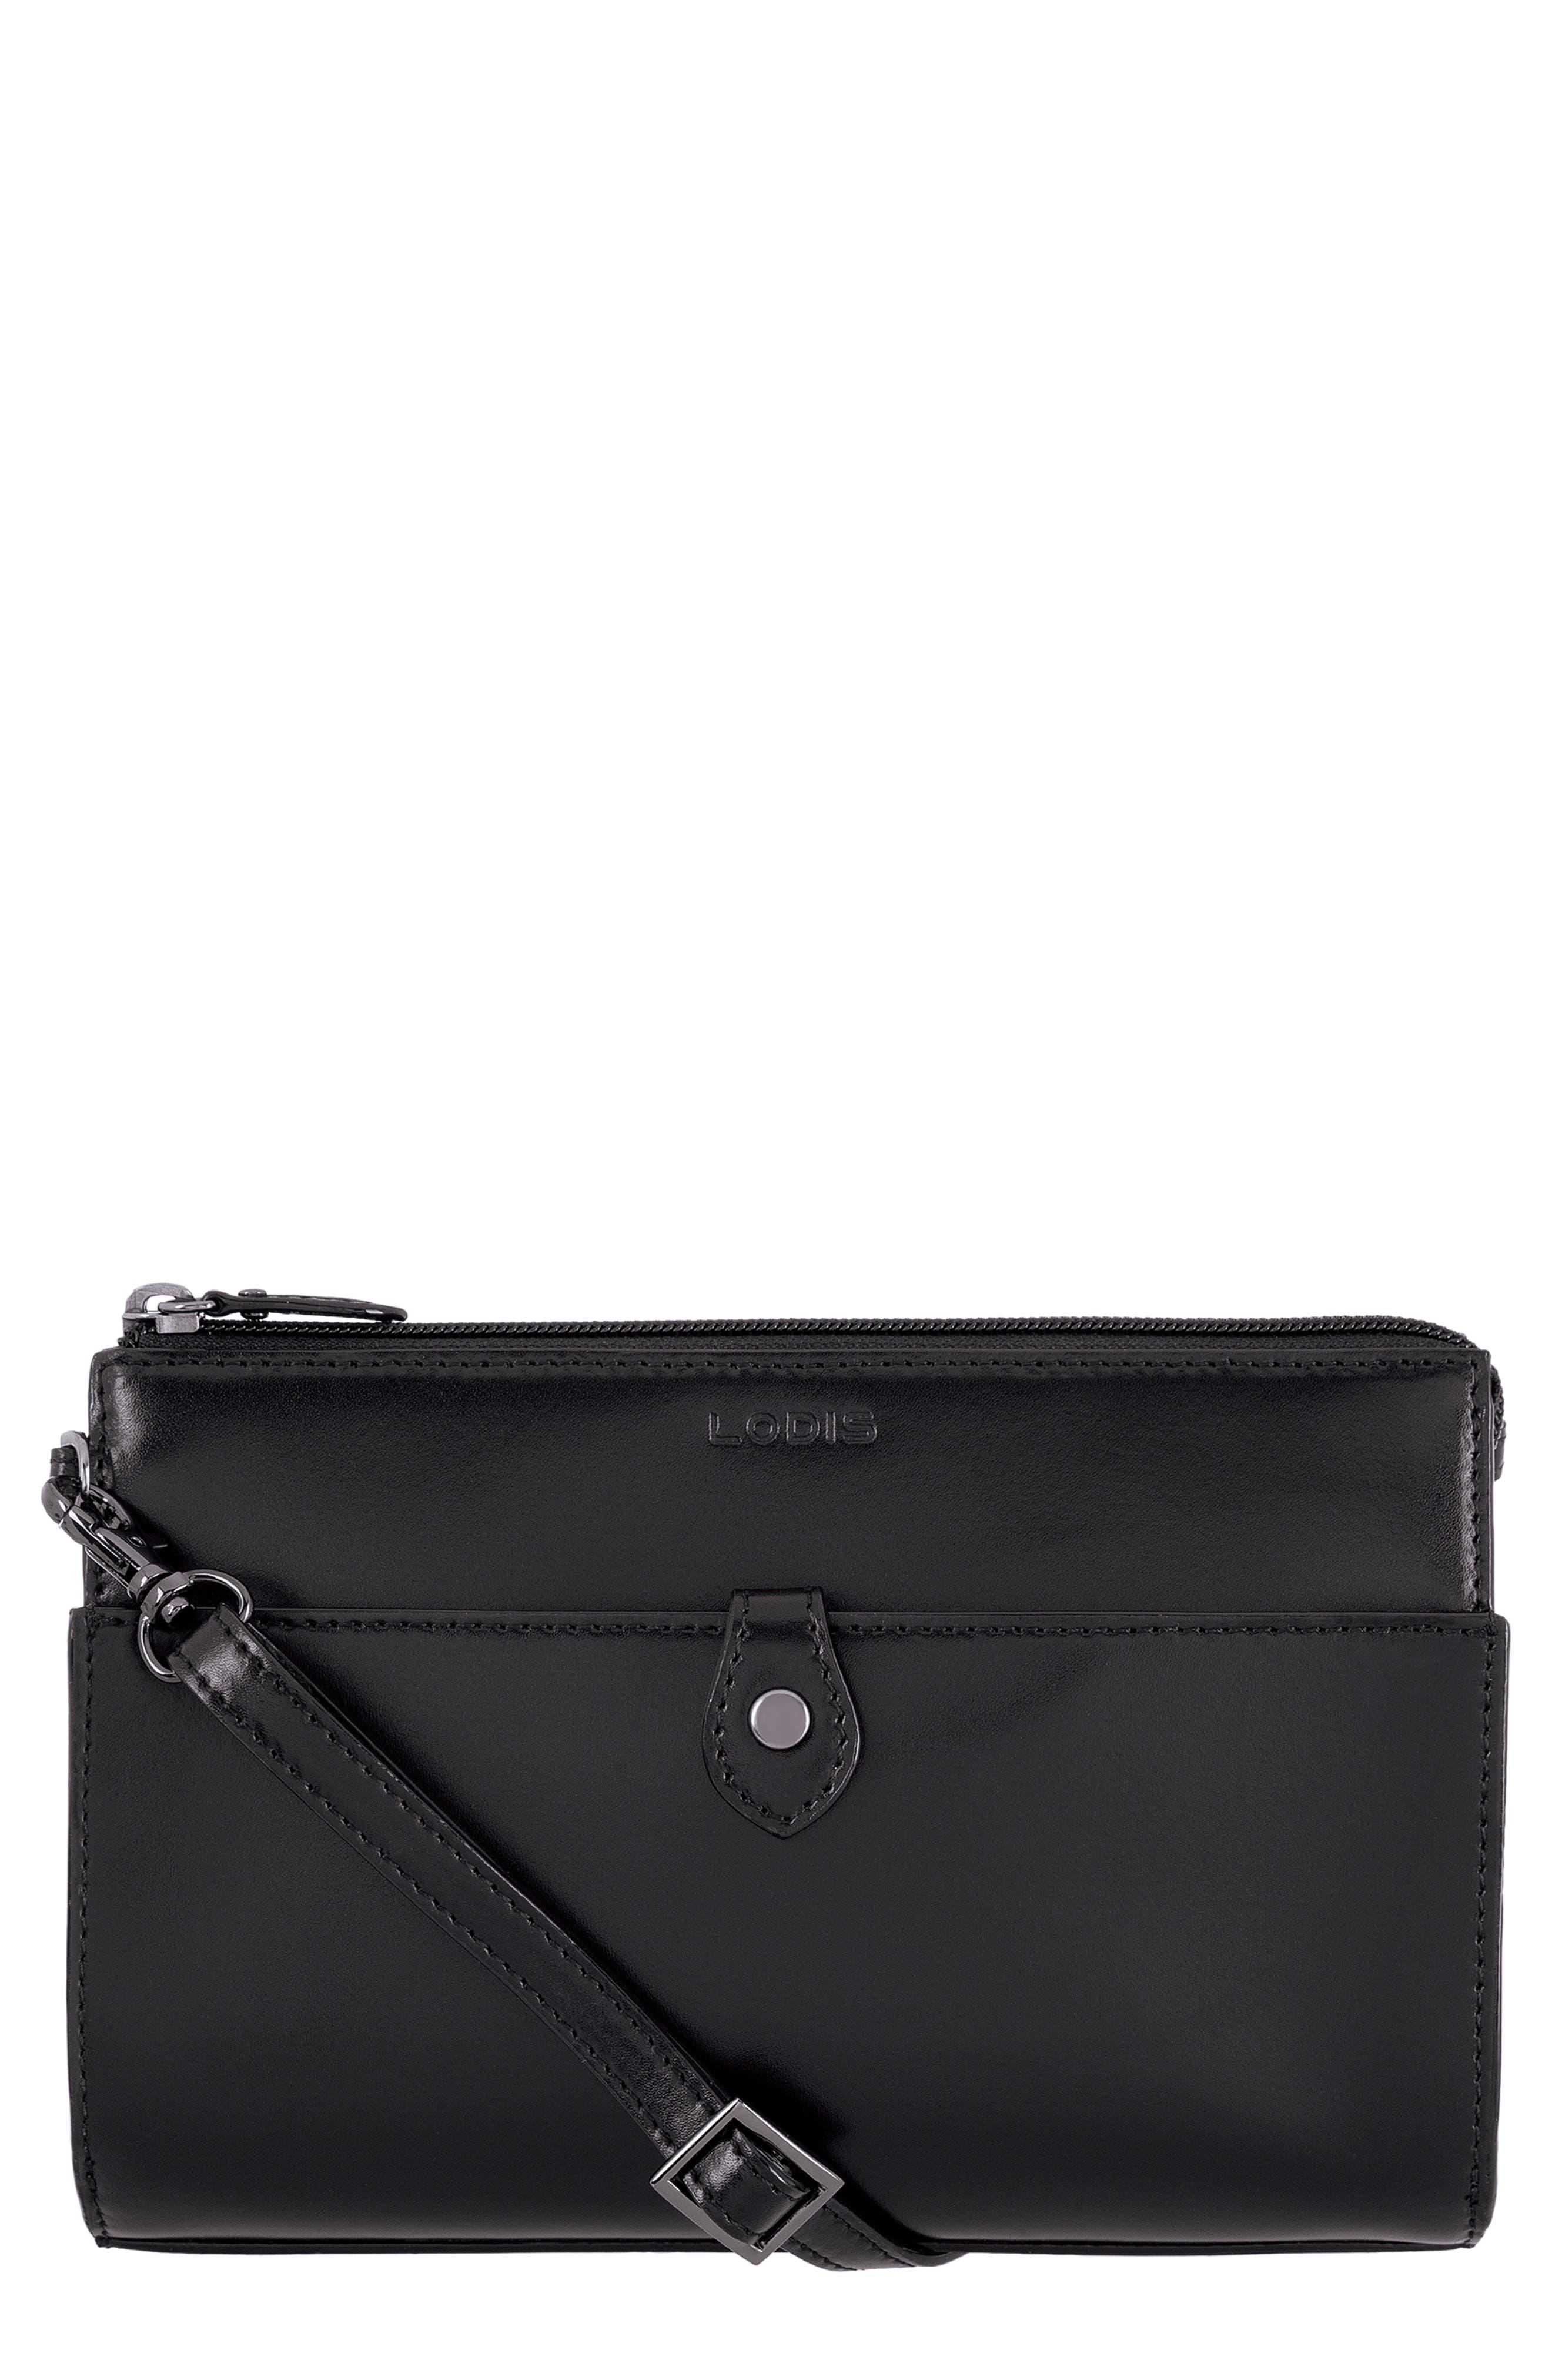 Audrey Under Lock & Key Vicky Convertible Leather Crossbody Bag,                             Main thumbnail 1, color,                             BLACK/ BLACK